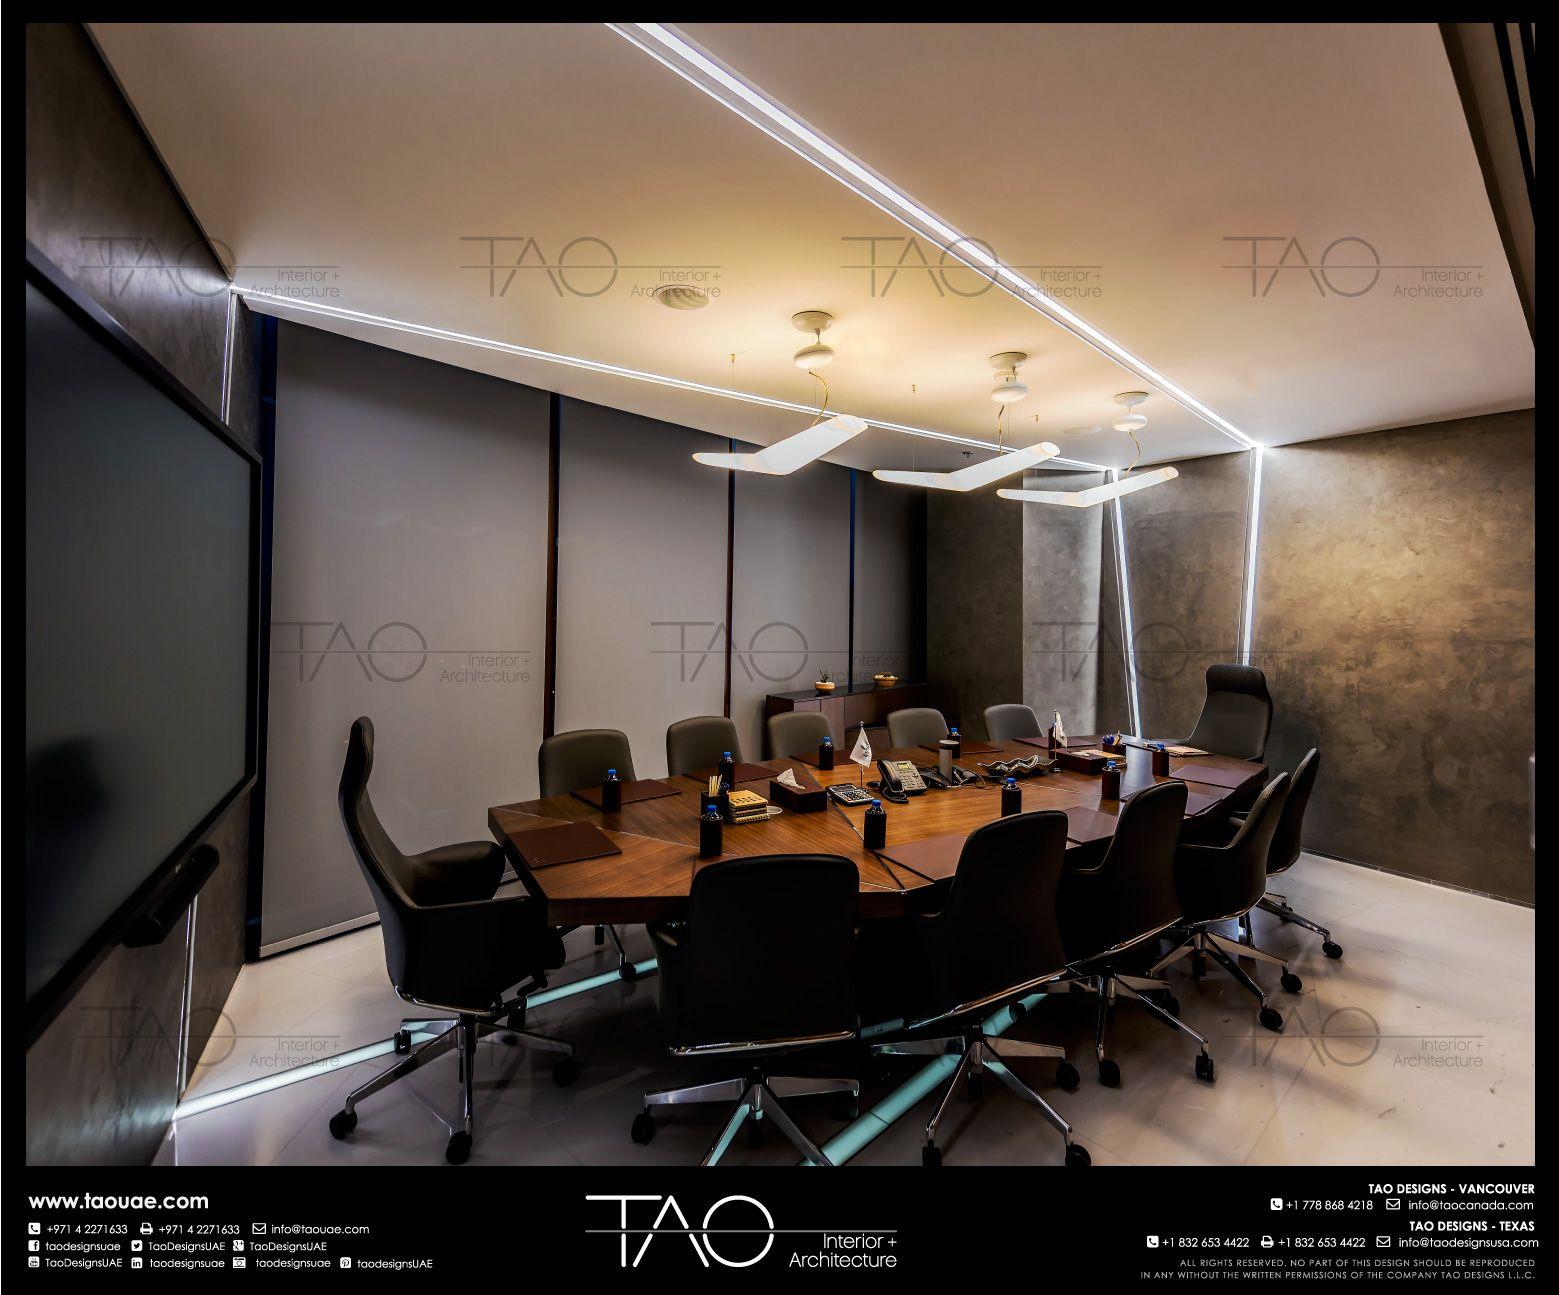 TAO Designs extend our commercial interior design